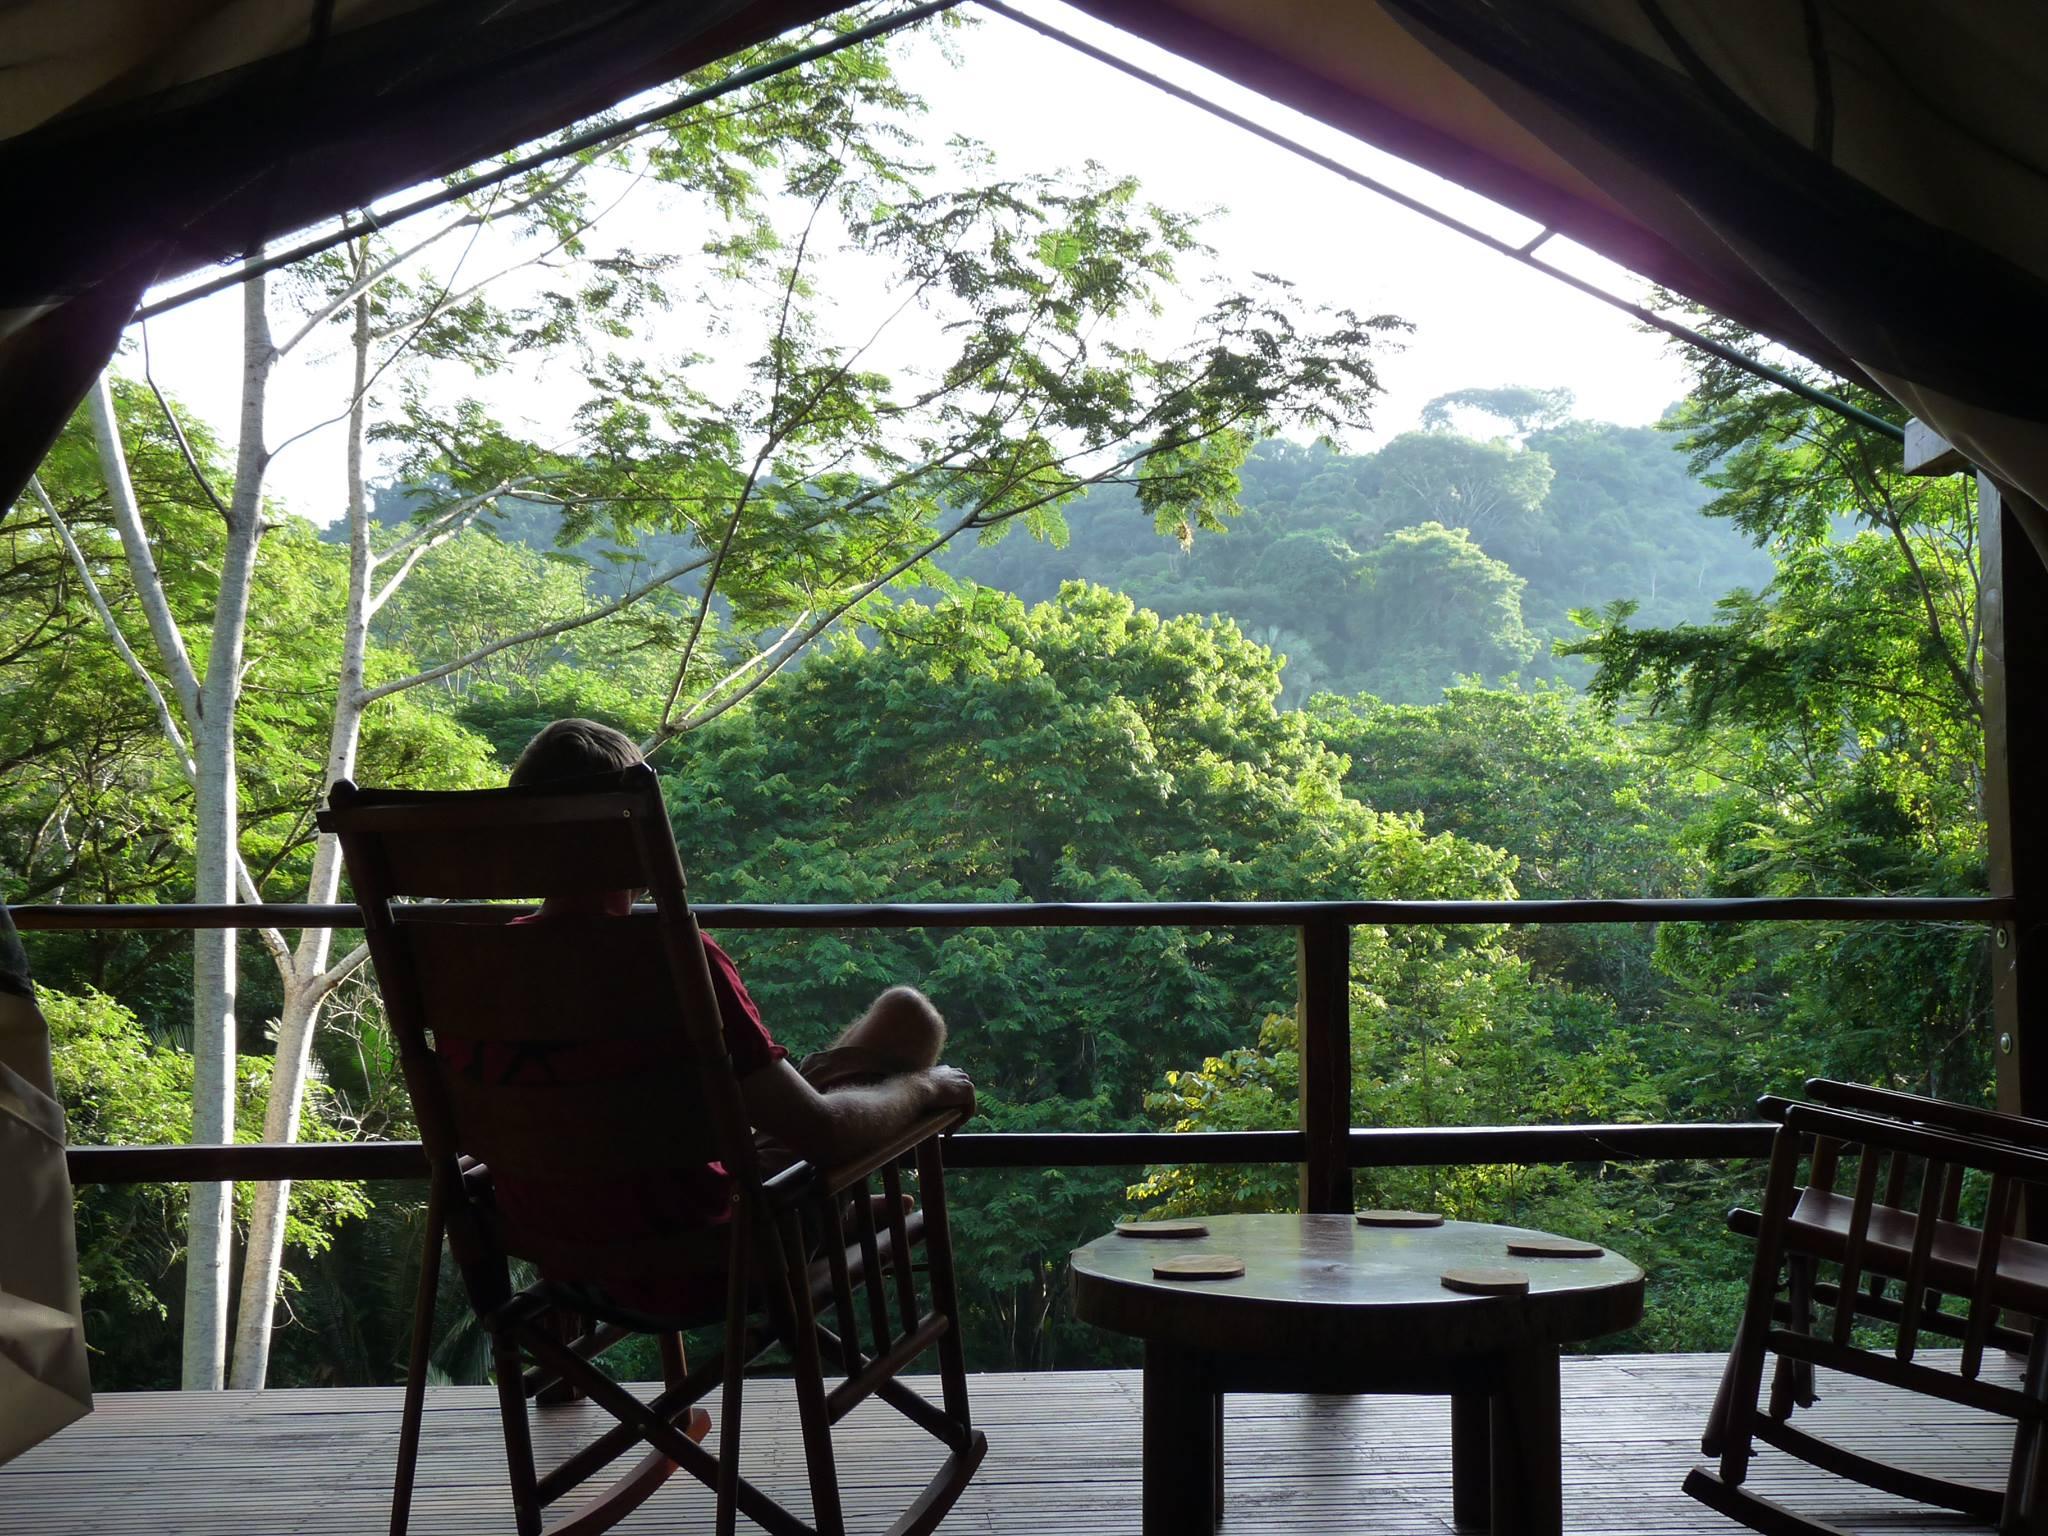 Wondrous Shade Tree Rainforest Glamping Download Free Architecture Designs Scobabritishbridgeorg